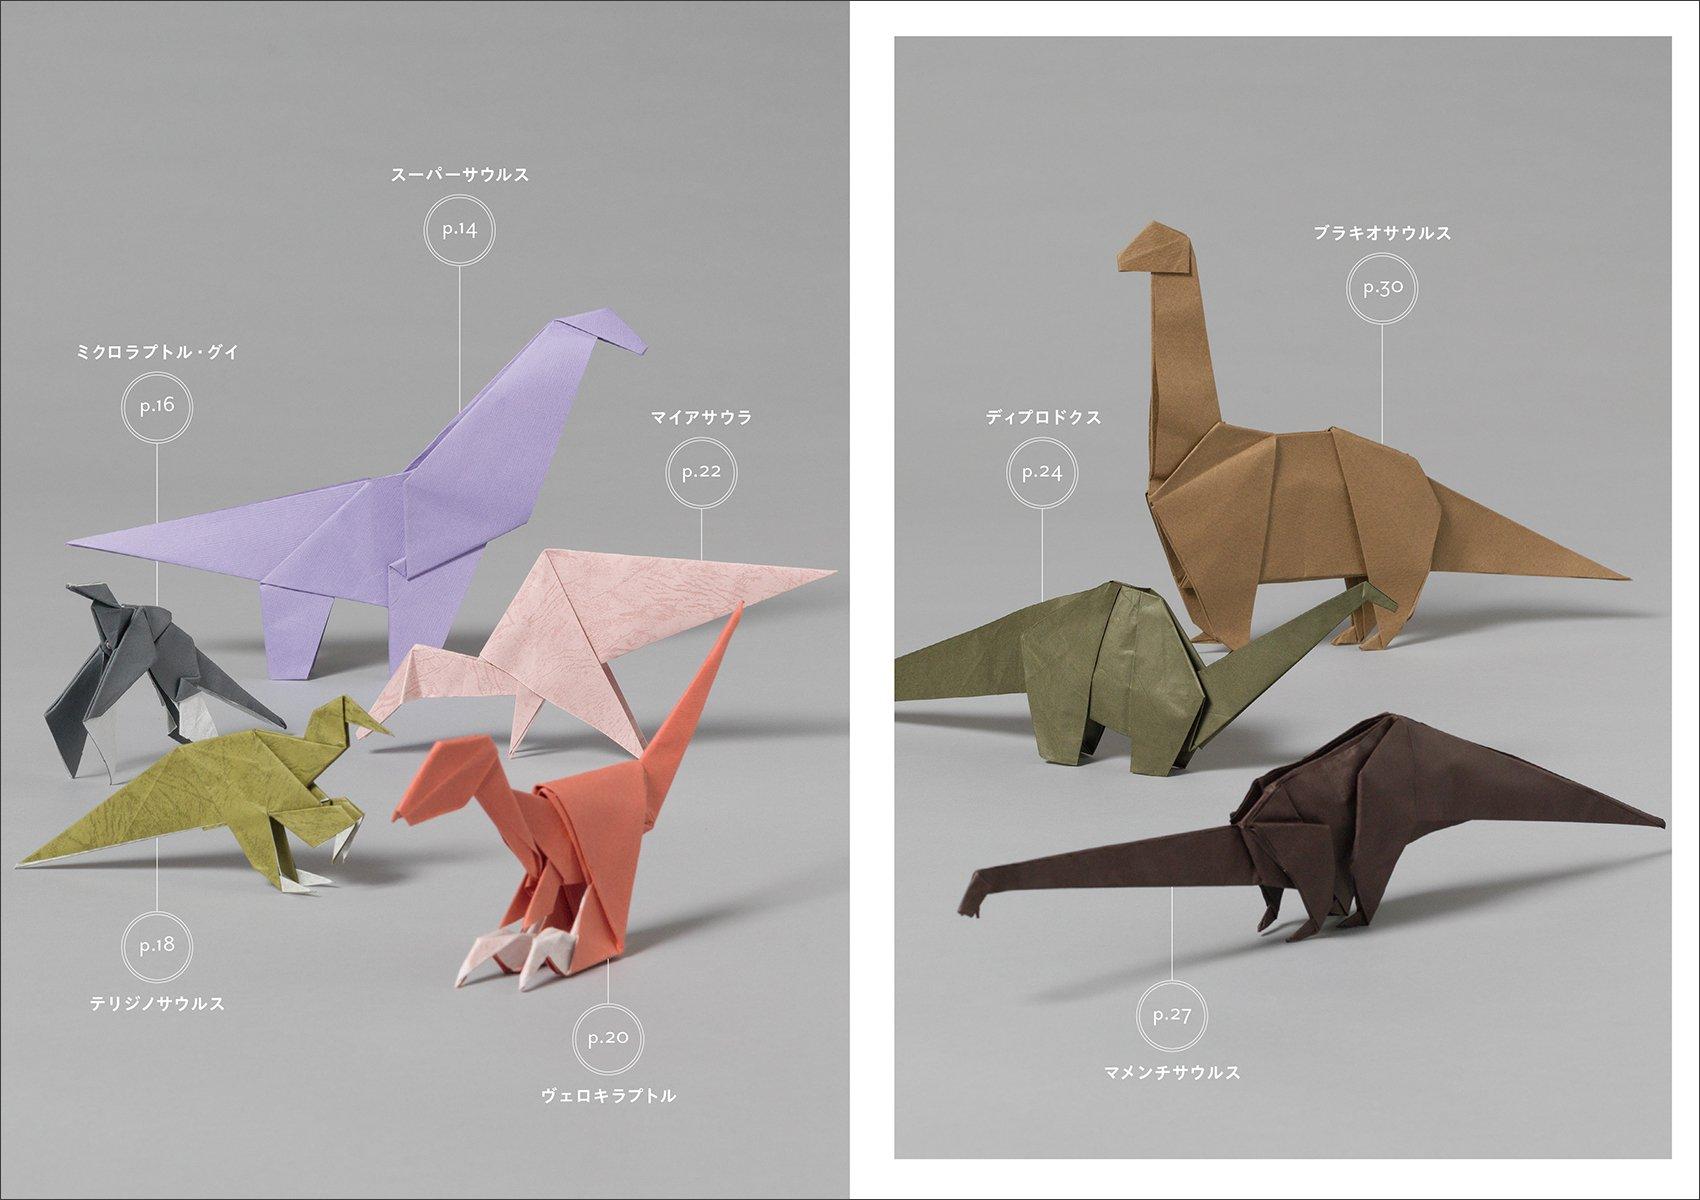 Https Spirits Origami Hagiwara Xml Dinosaur Diagrams Fumiaki Kawahata Dinosaurs 1